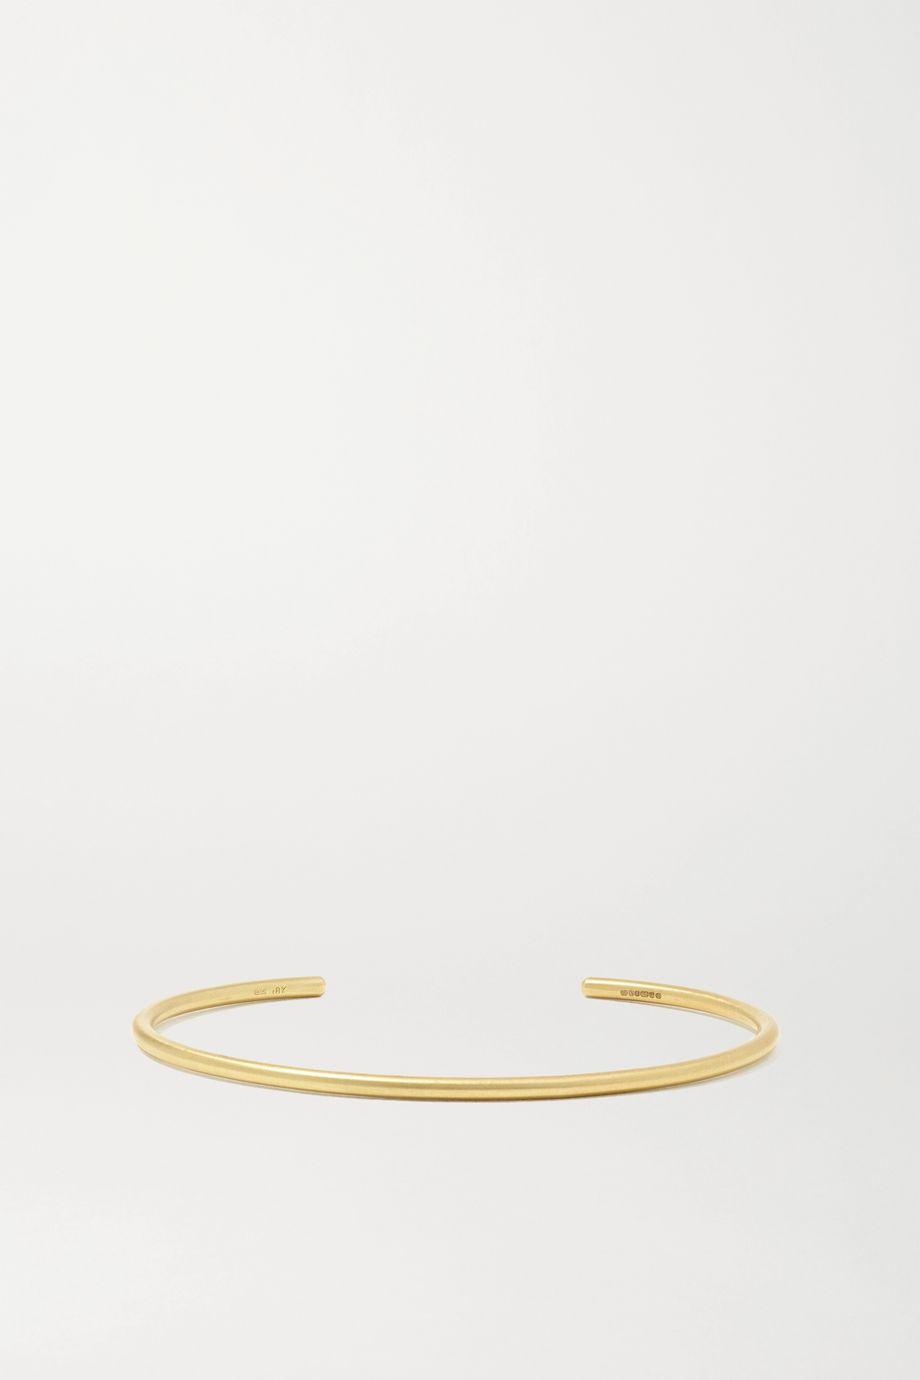 Brooke Gregson 18-karat gold cuff